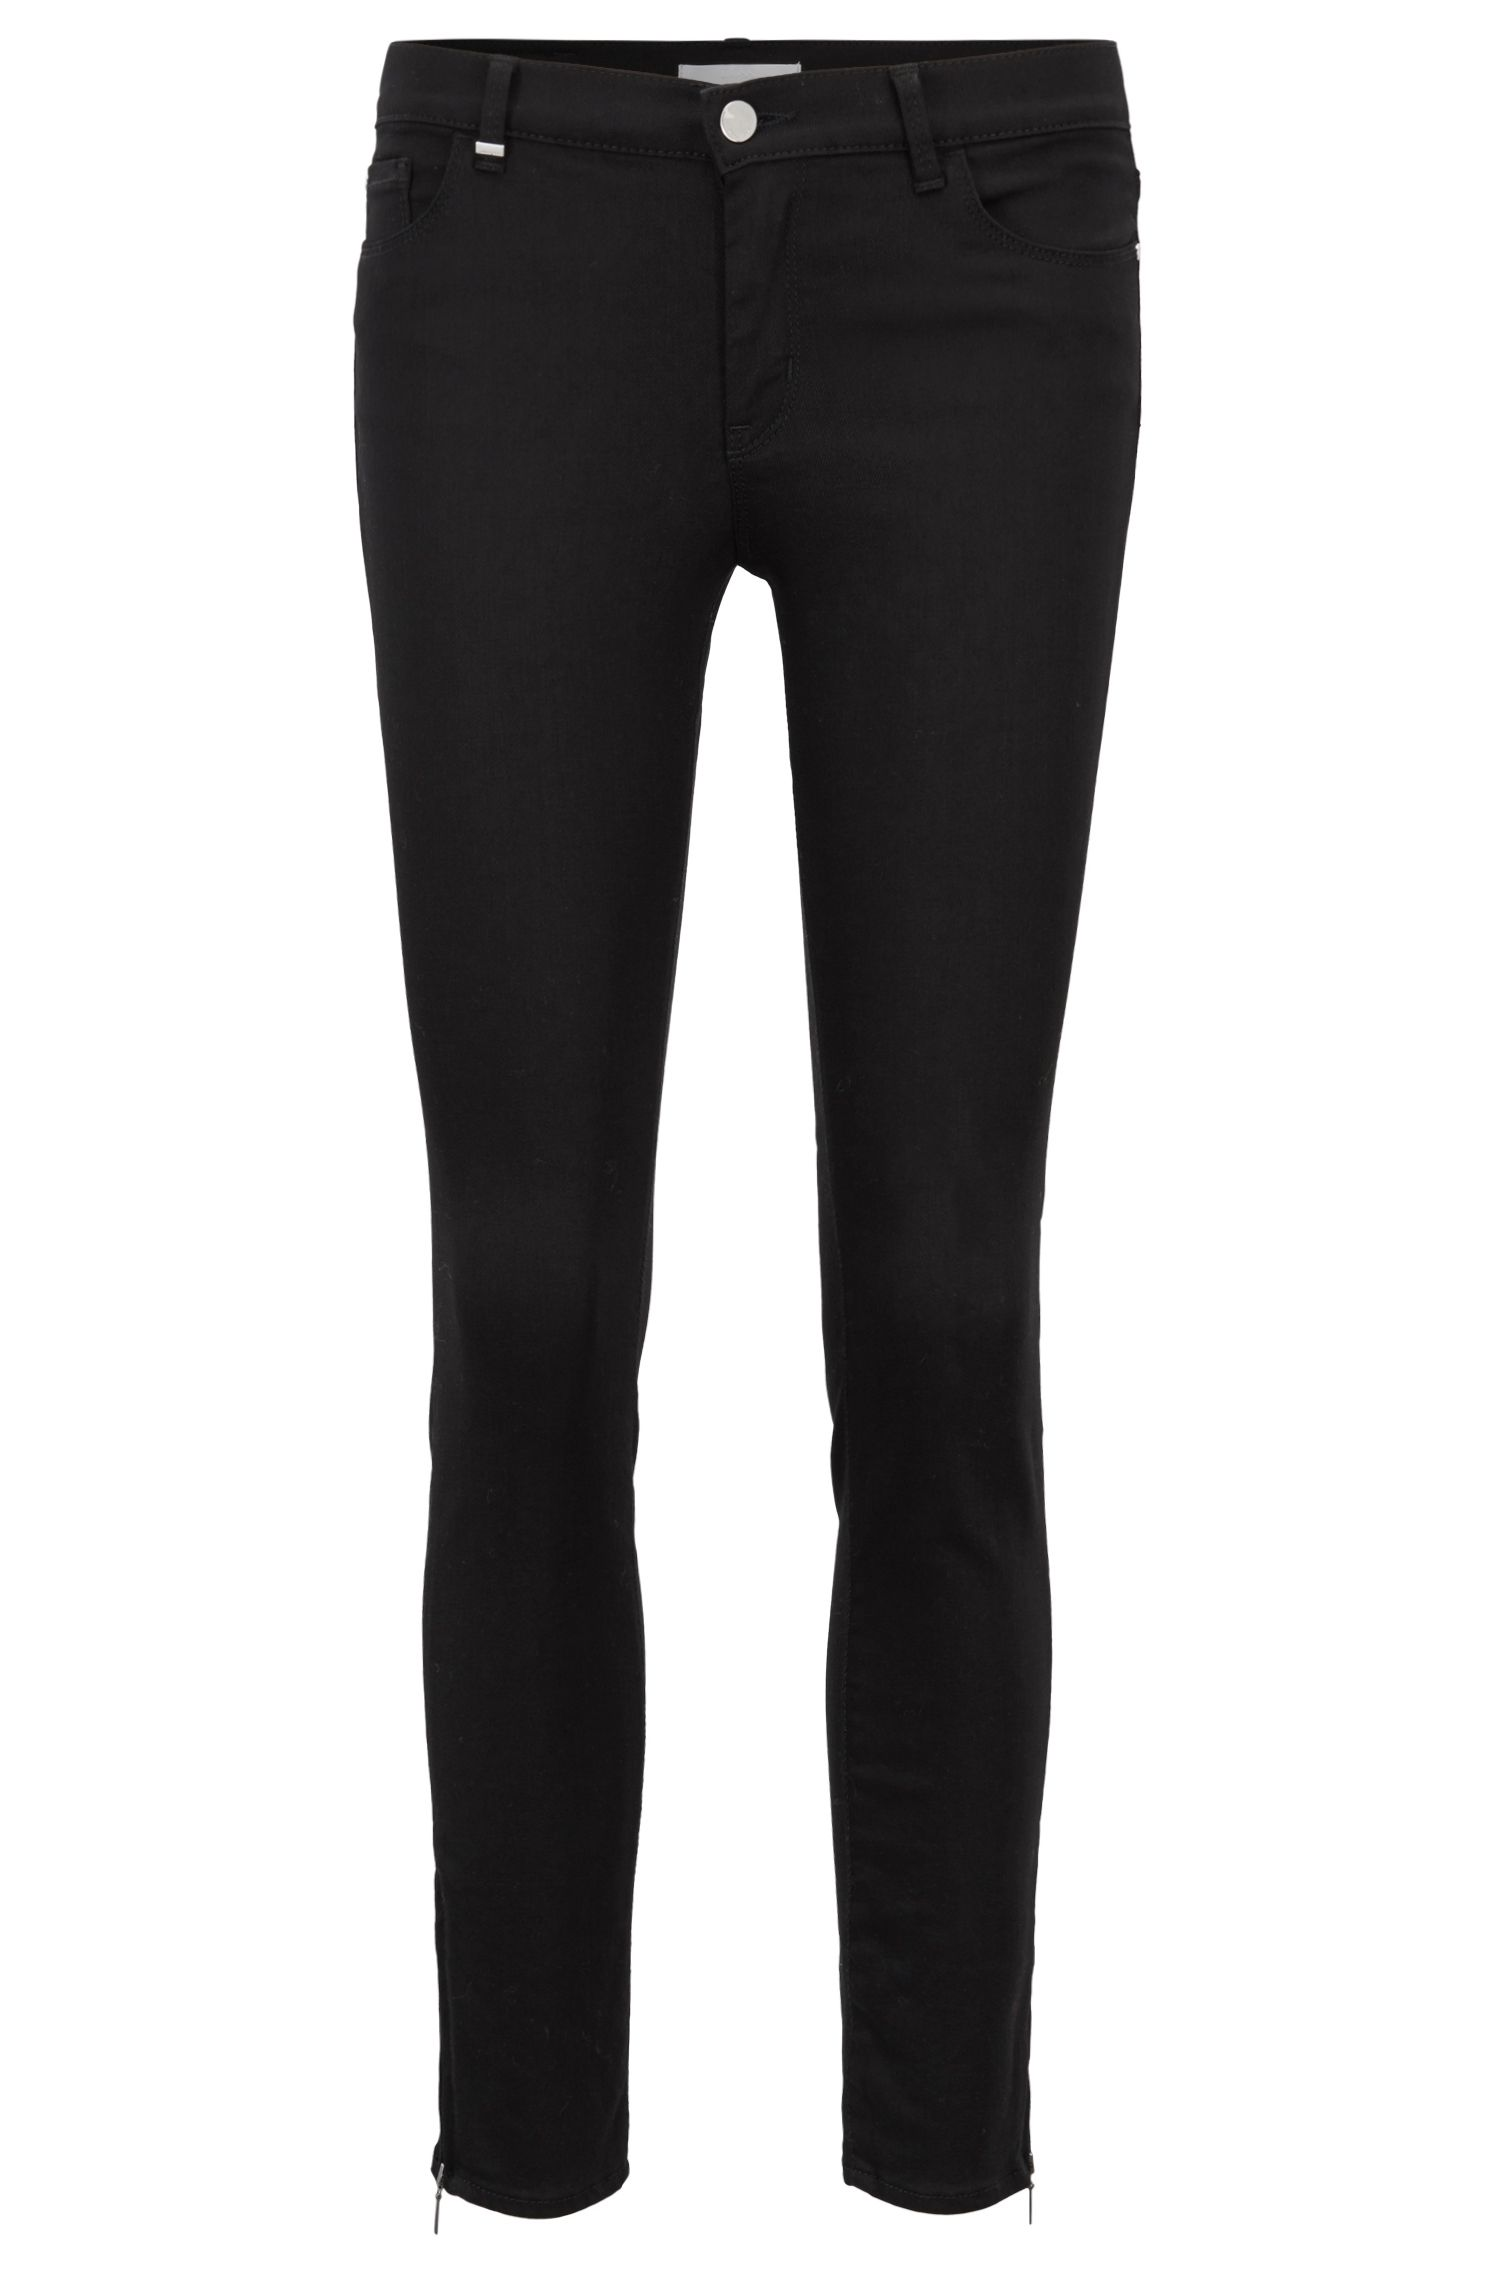 Slim-fit cropped jeans in Stay Black stretch denim, Black